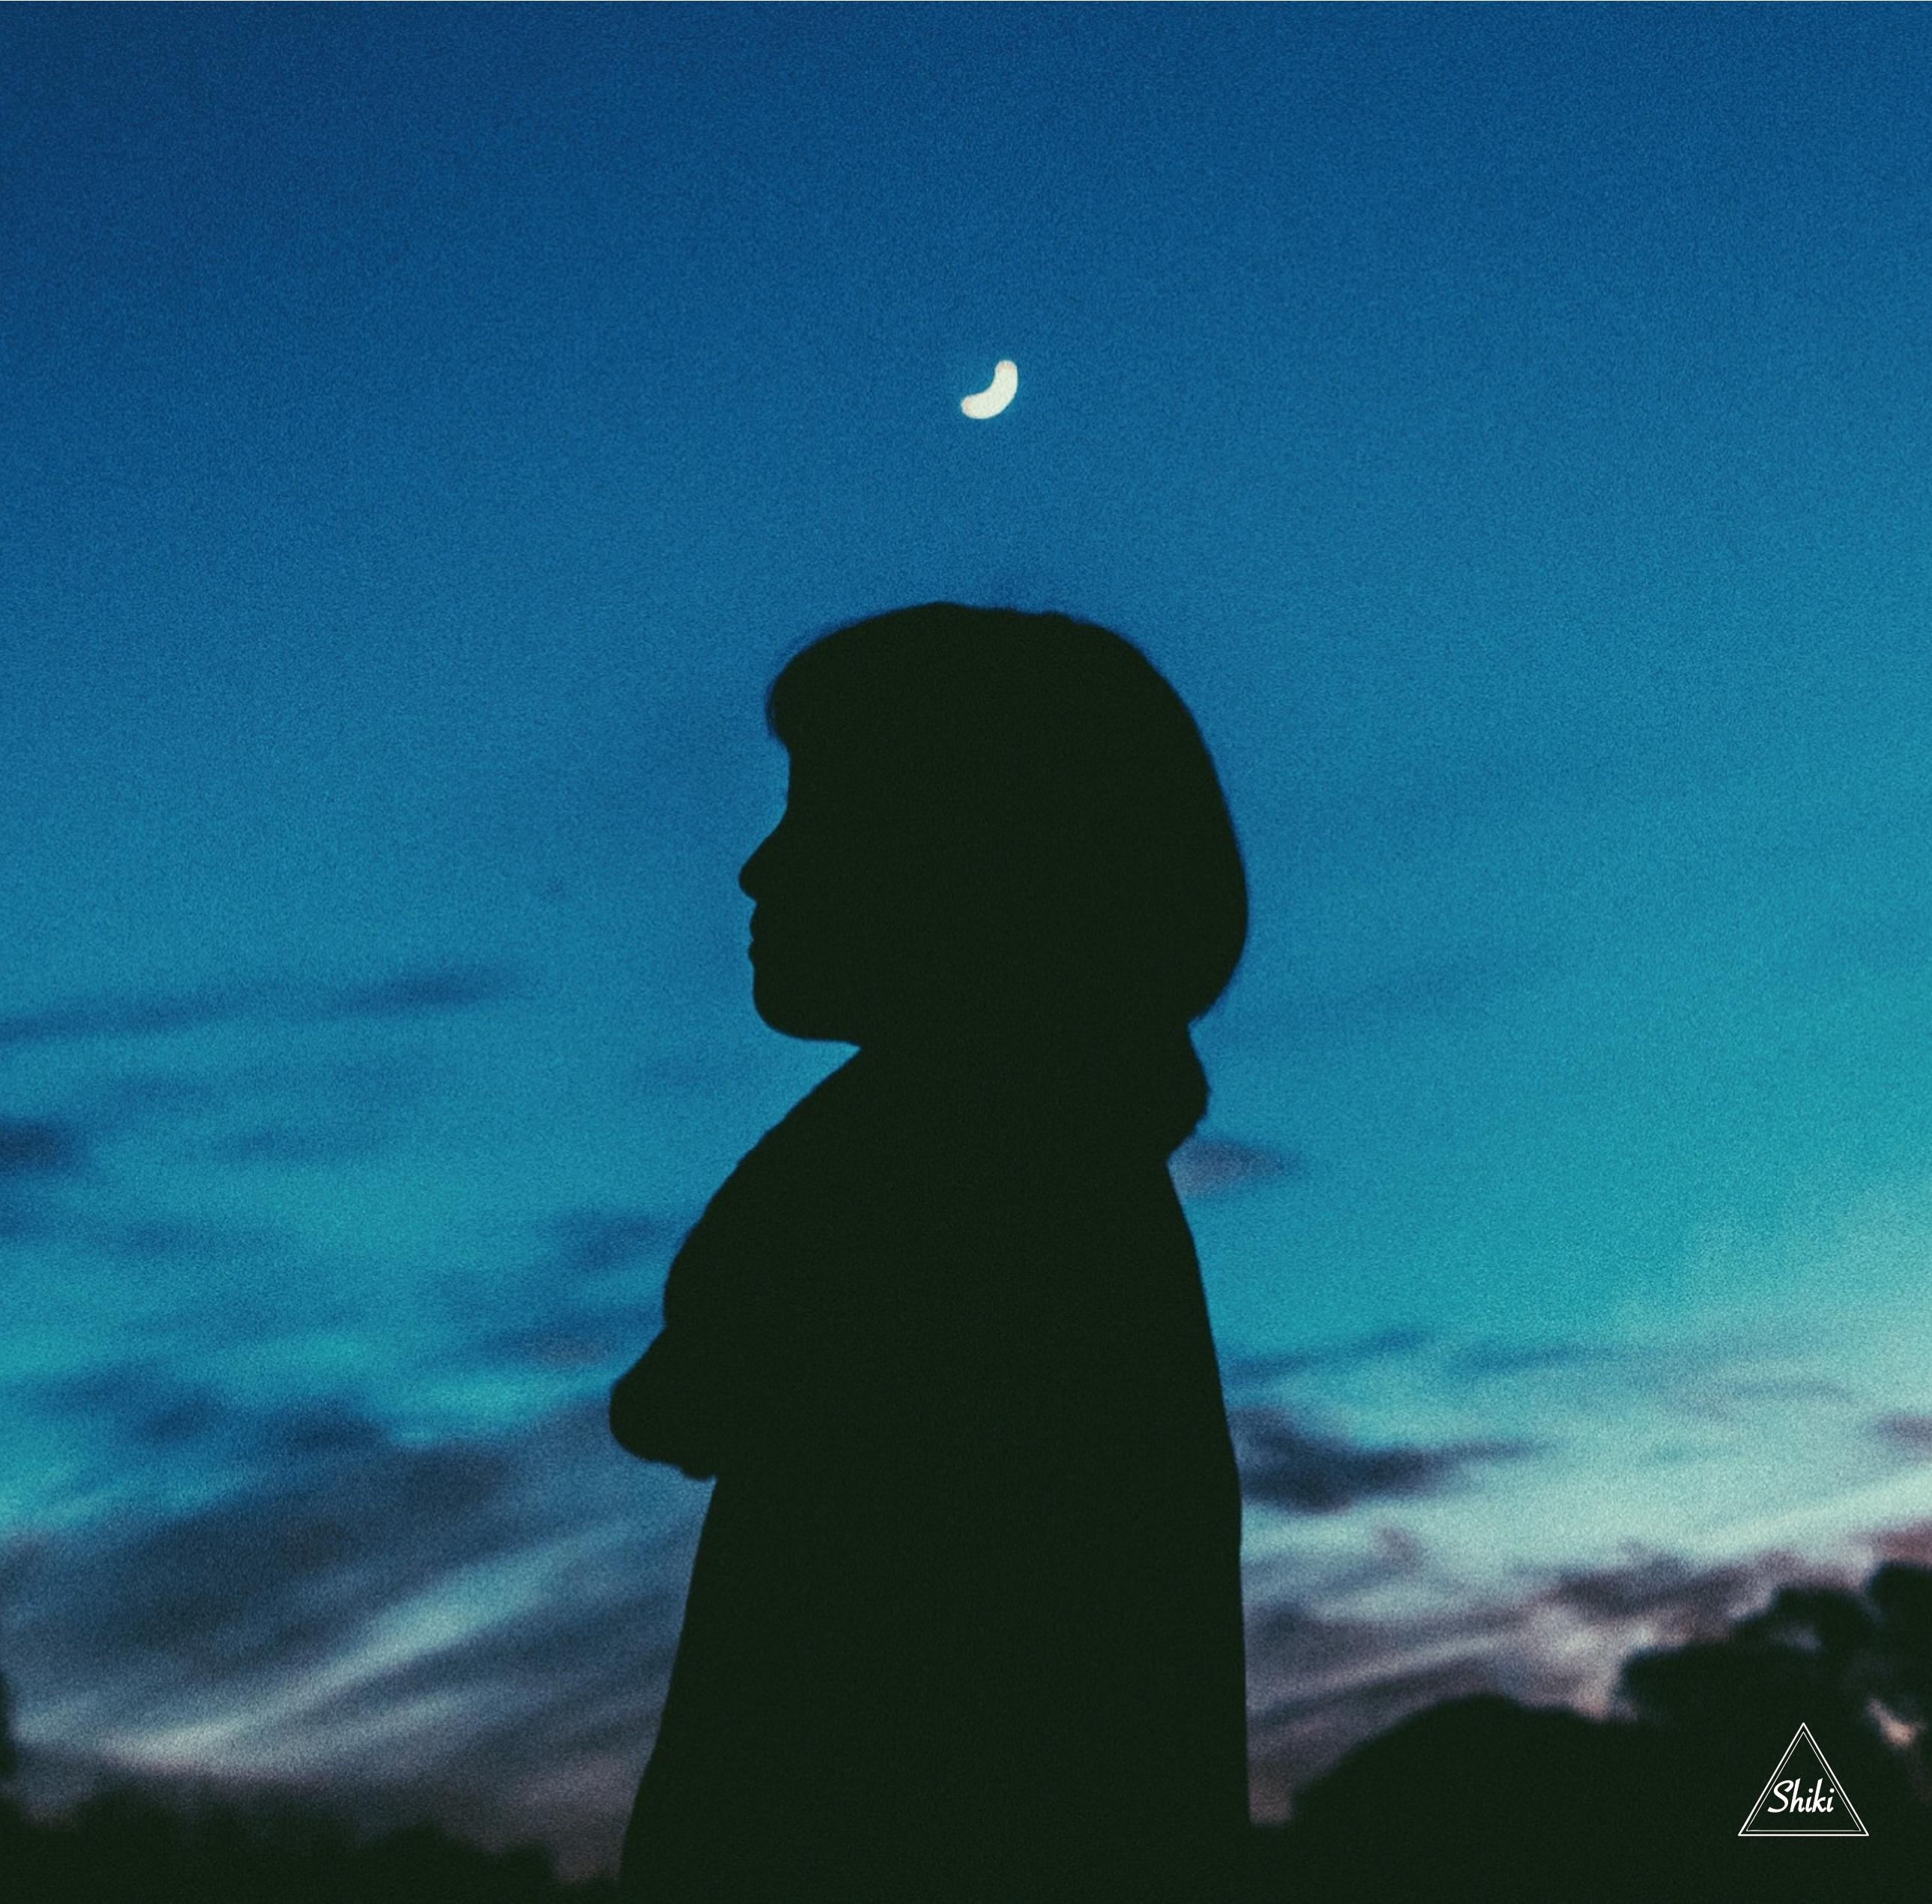 040_Awaku,Aoi feat. 野崎りこん / Melody of life